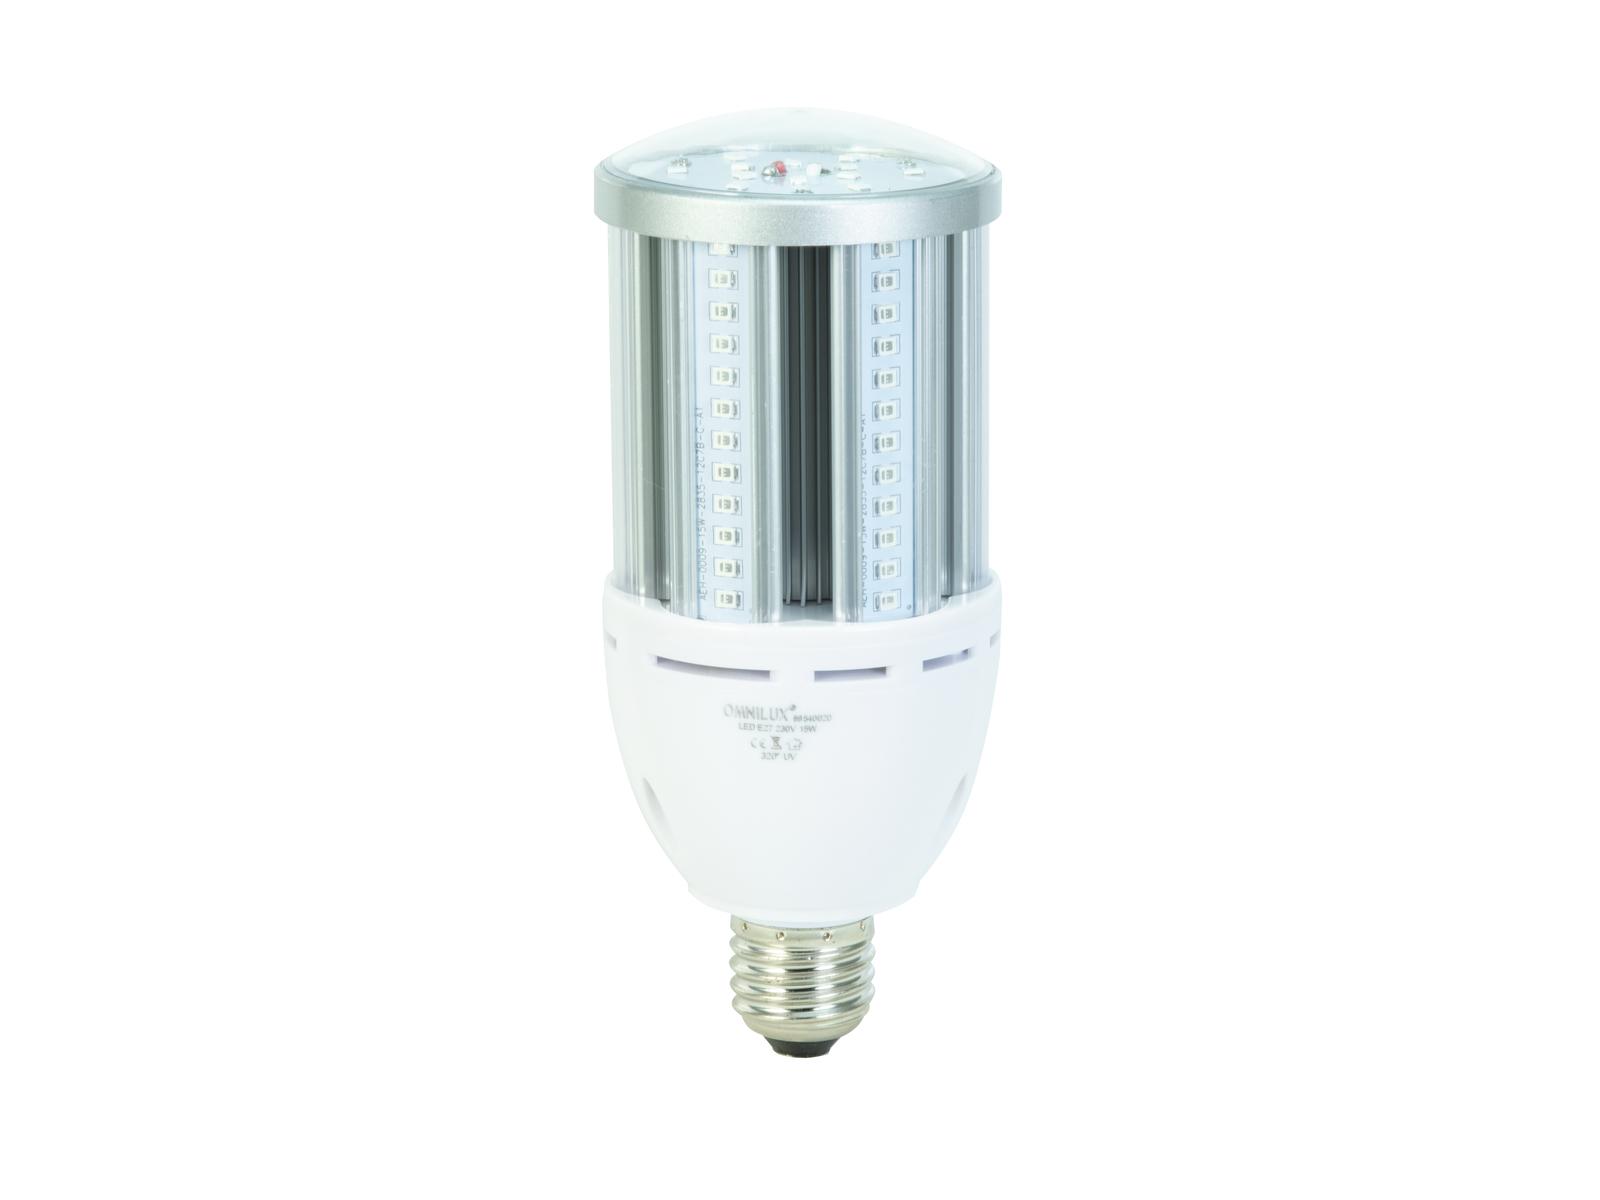 OMNILUX LED E-27 230V 15W 80 Led UV